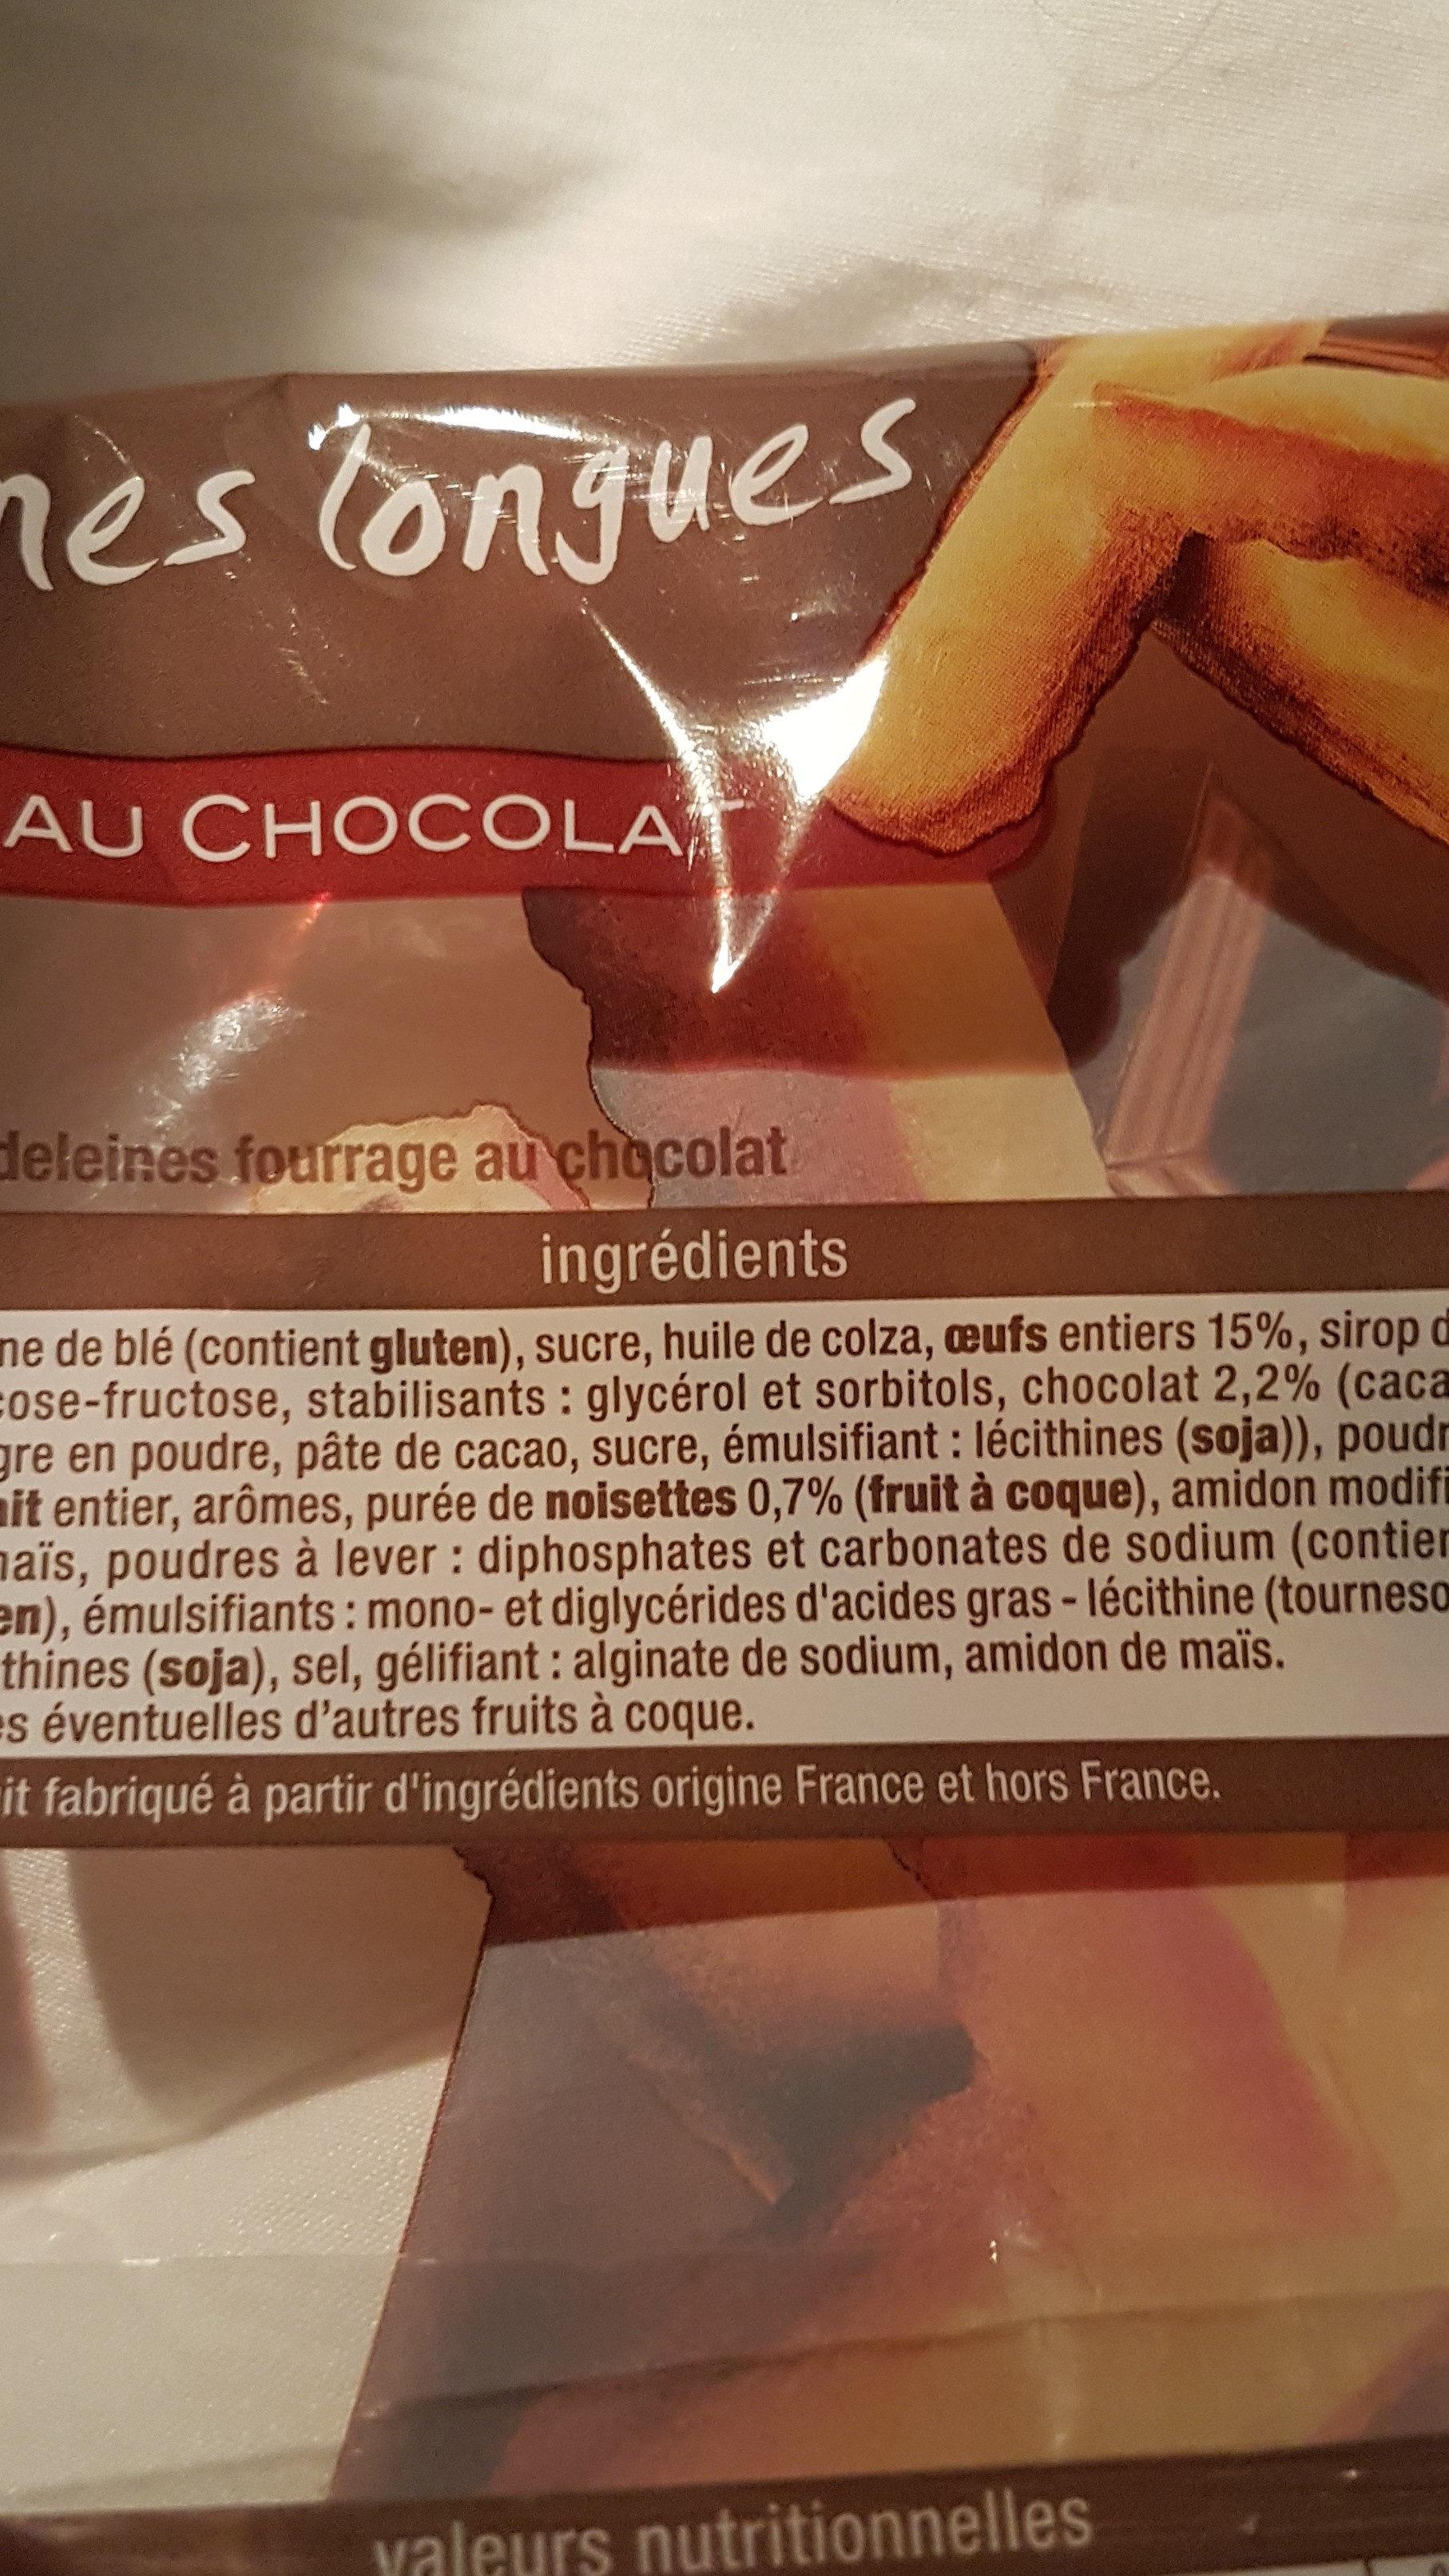 madeleines longues fourrées au chocolat - Ingredients - fr